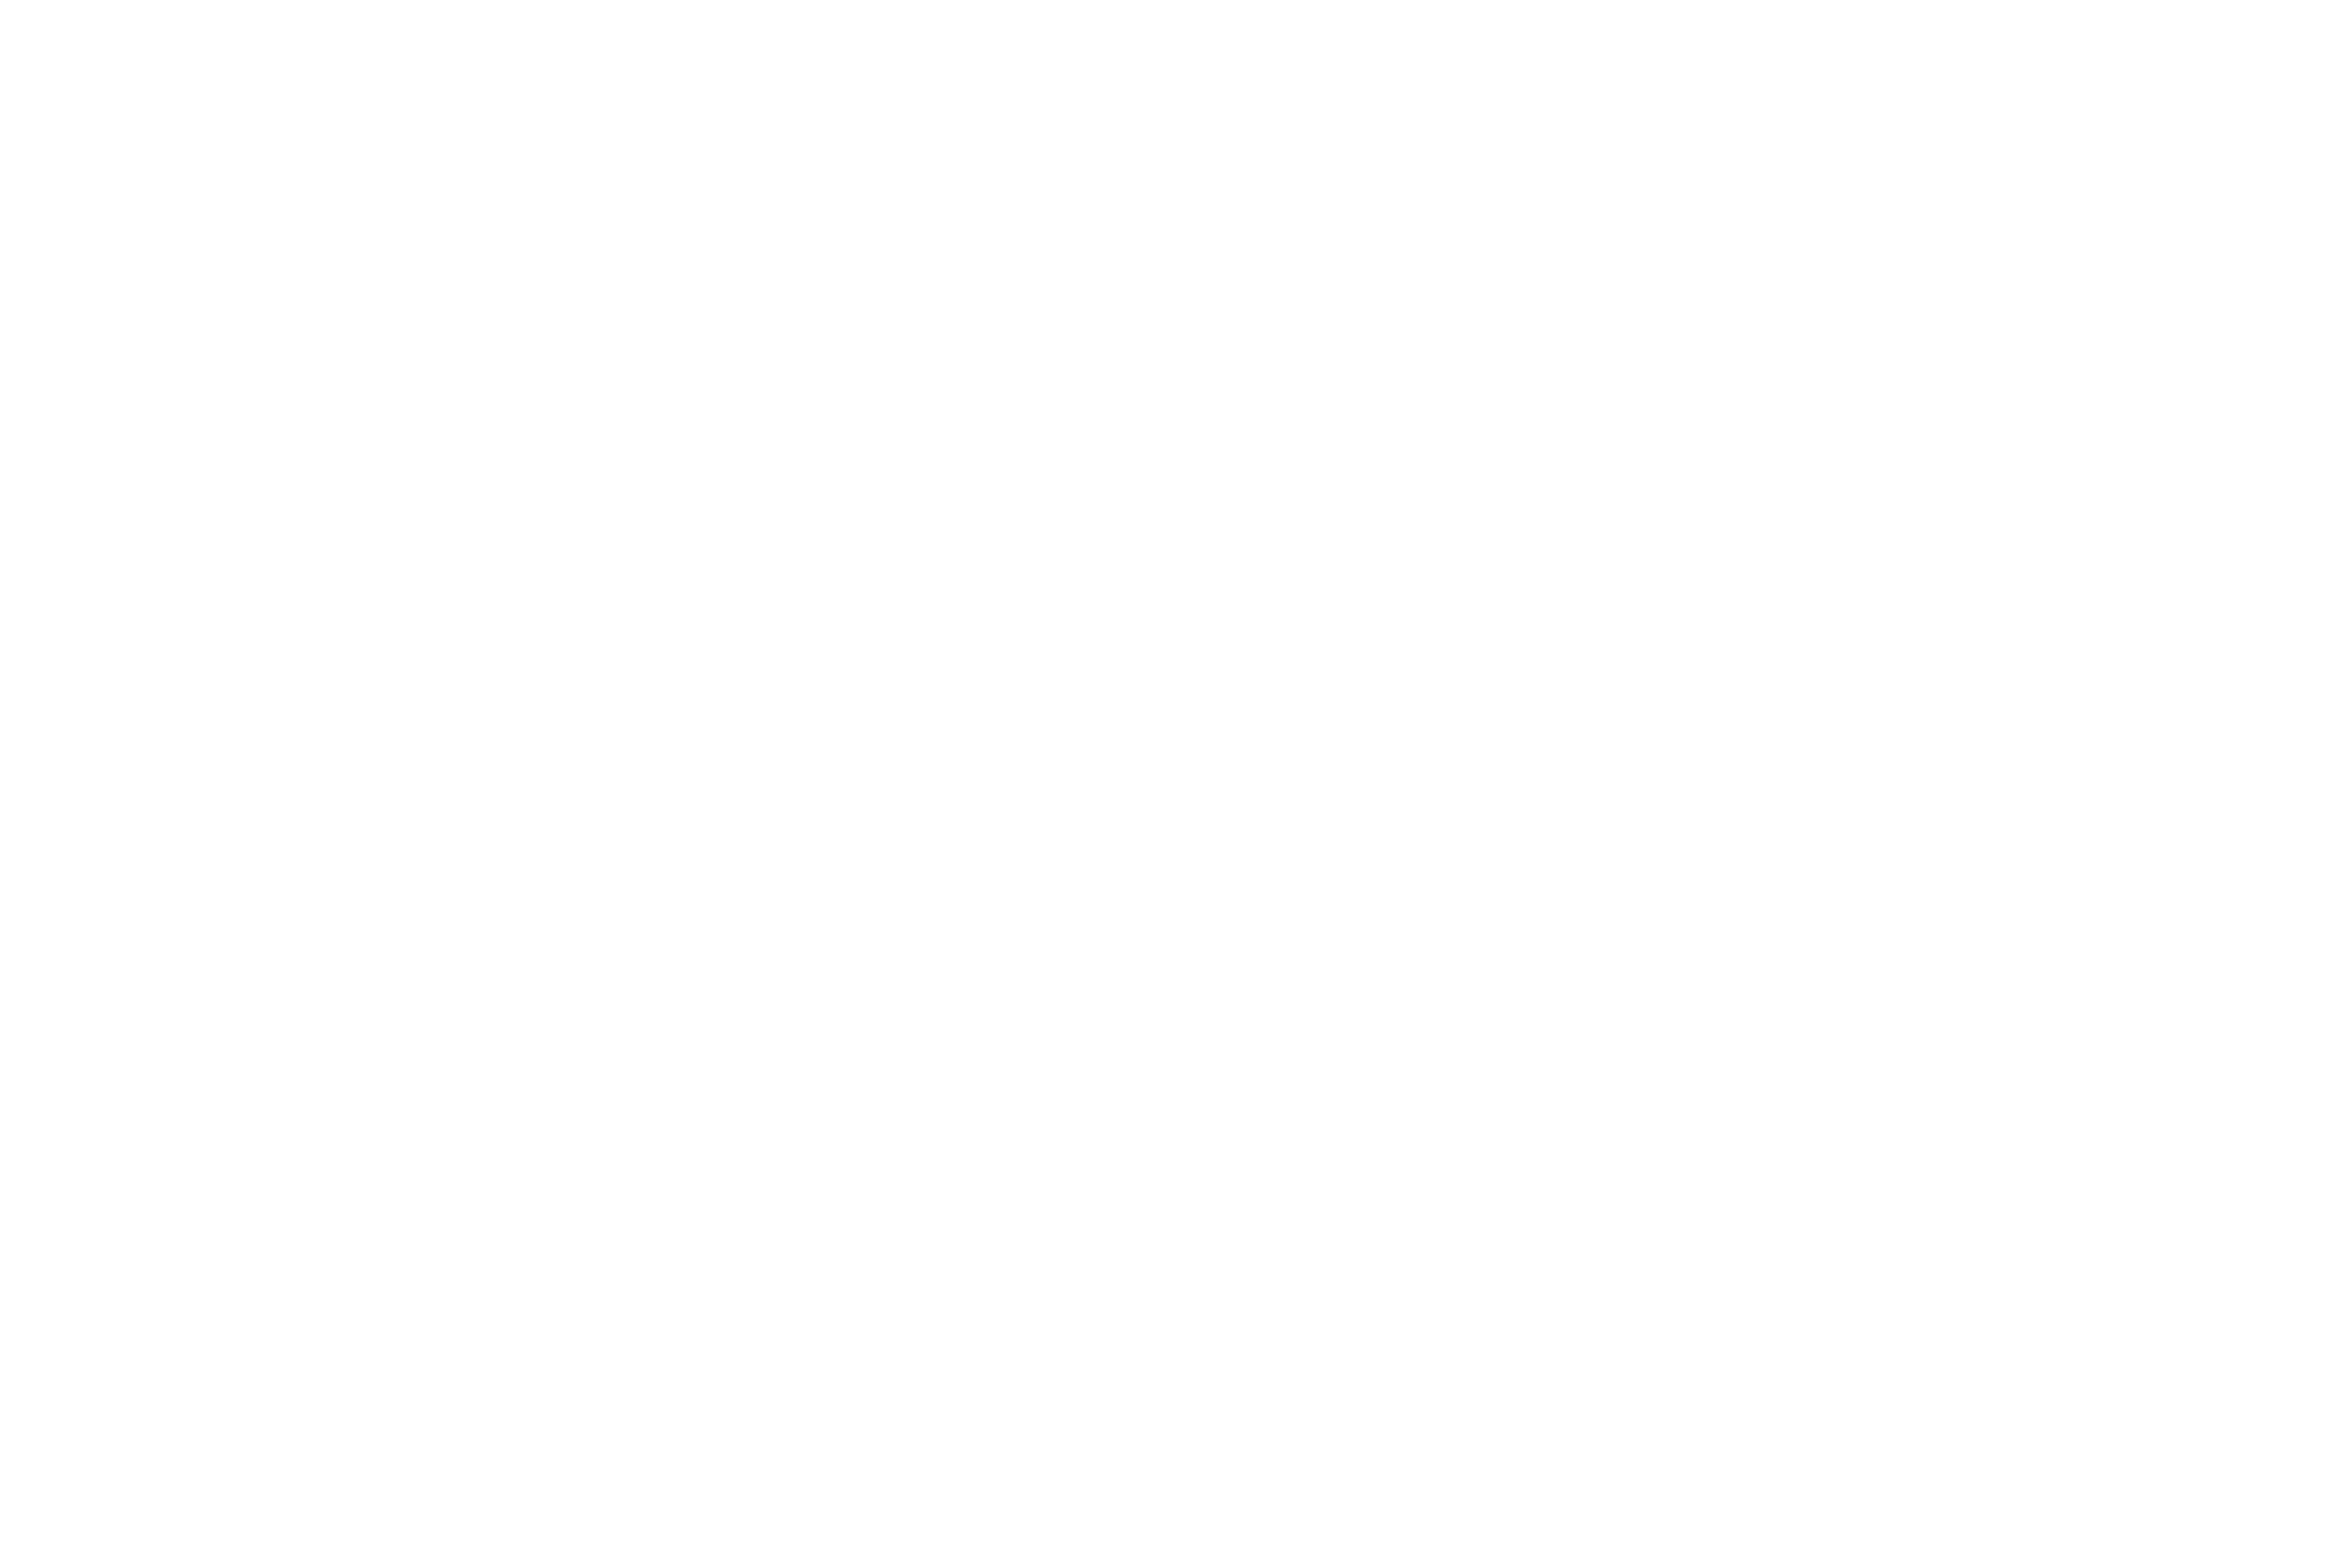 GoPro stock - Should You Buy GoPro Stock? 3 Pros, 3 Cons (GPRO)